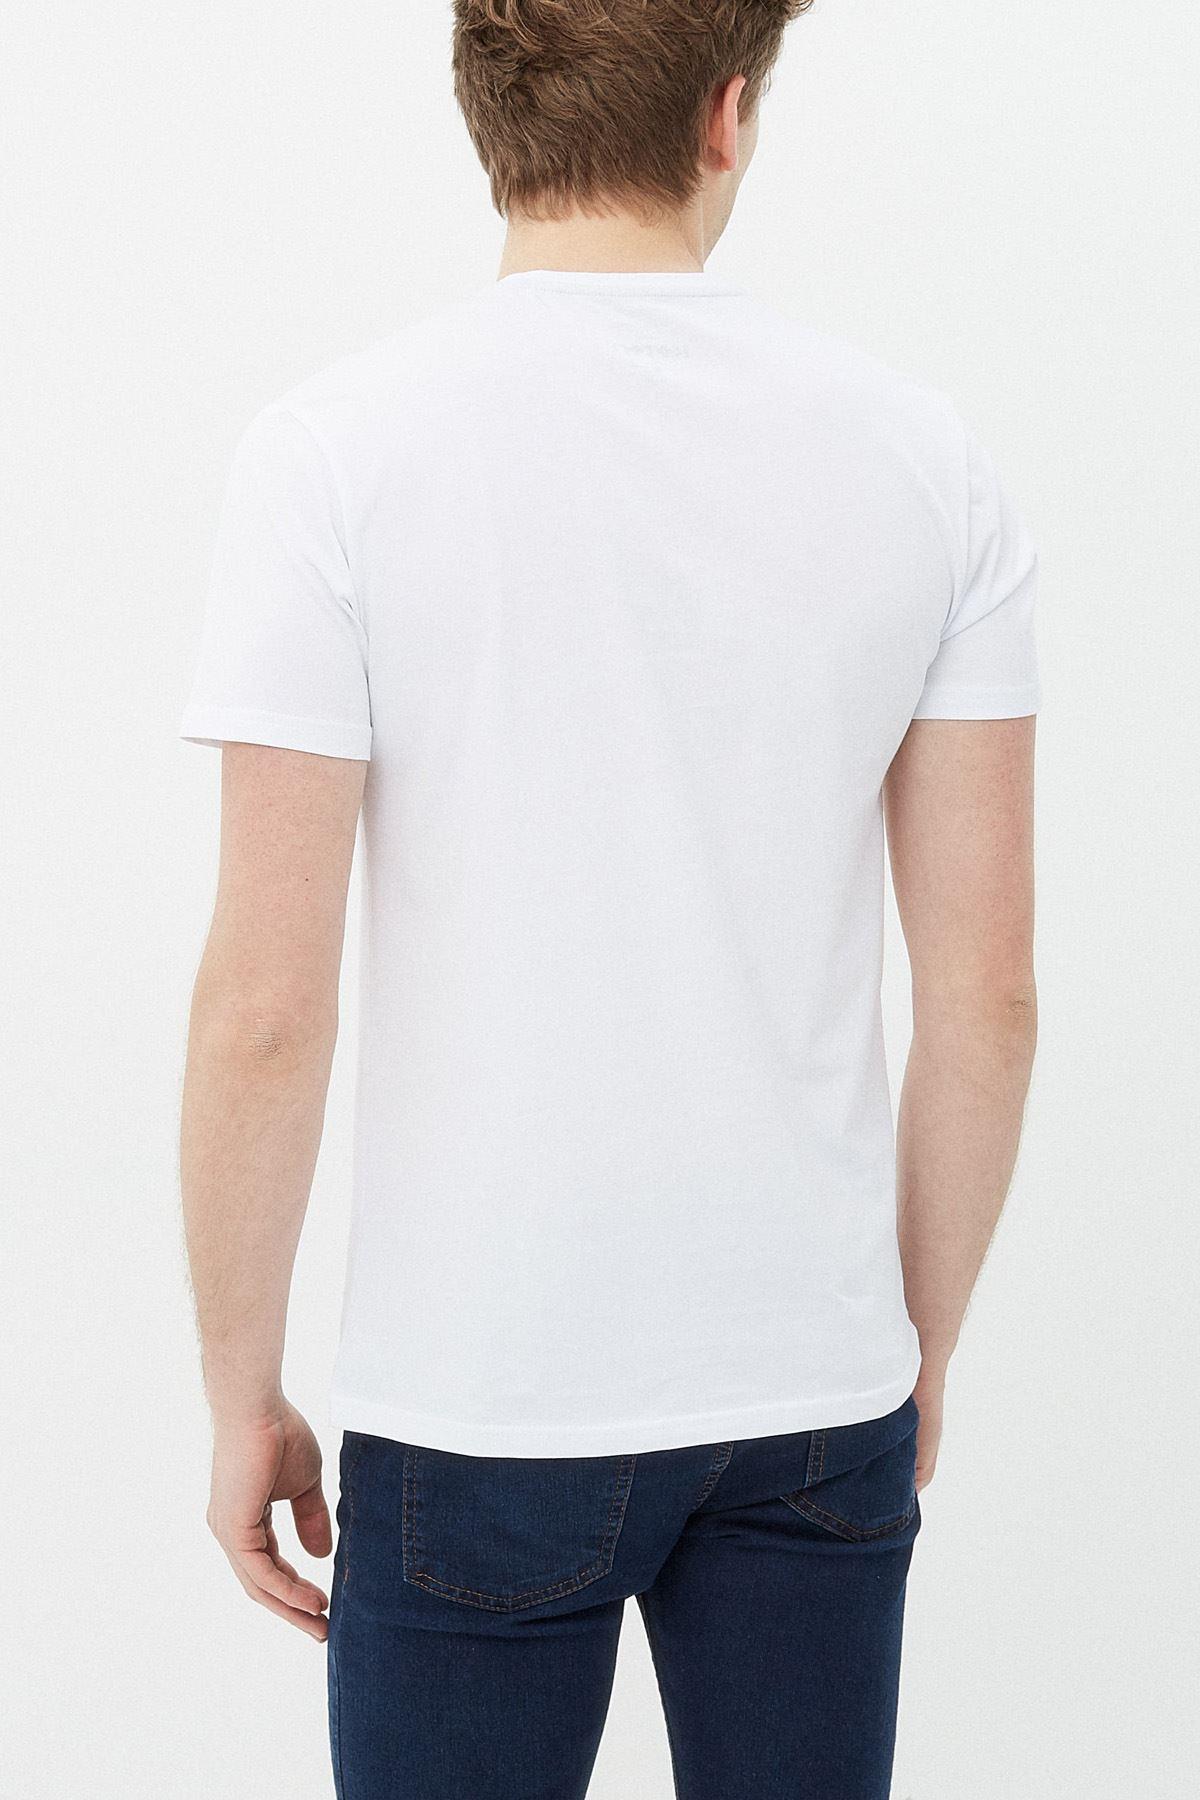 Anime Death Note 03 Beyaz Erkek Tshirt - Tişört